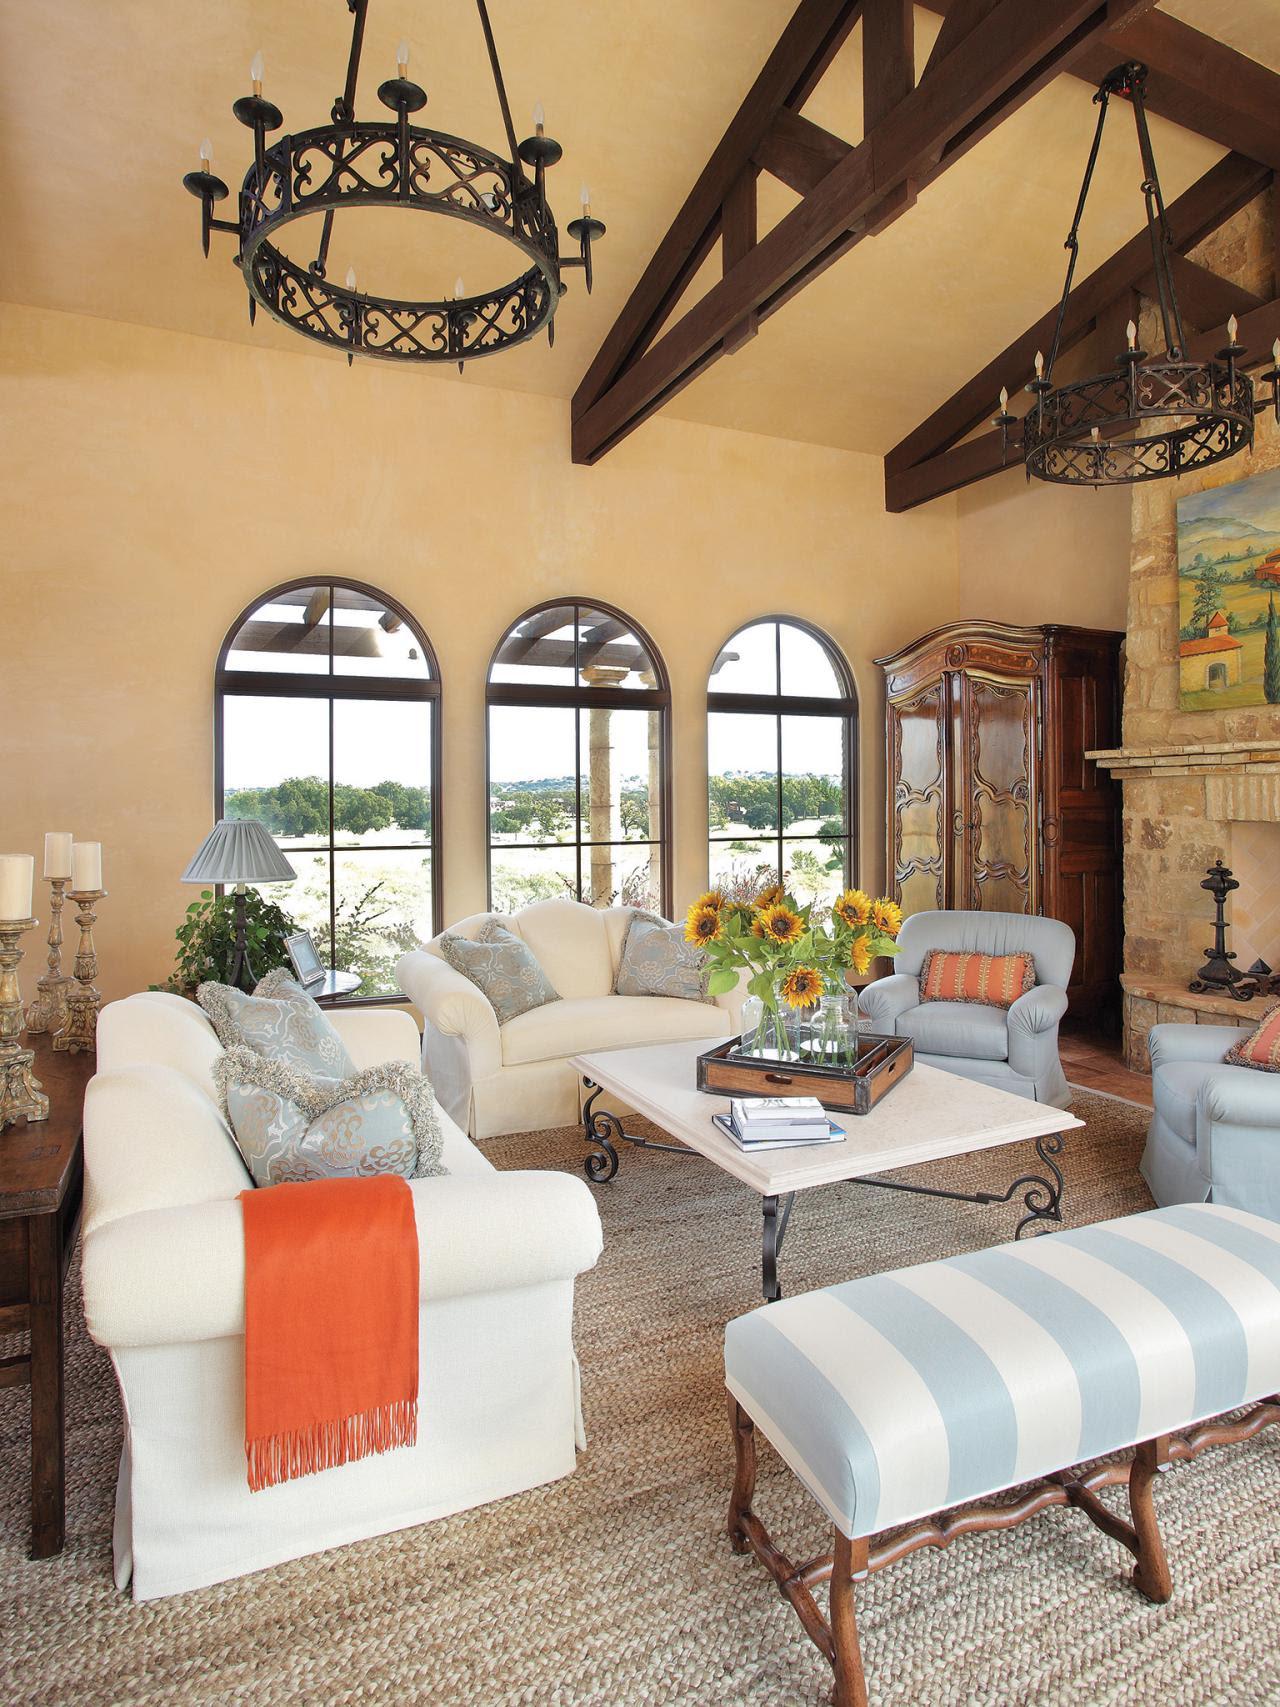 25 Mediterranean Living Room Design Ideas - Decoration Love